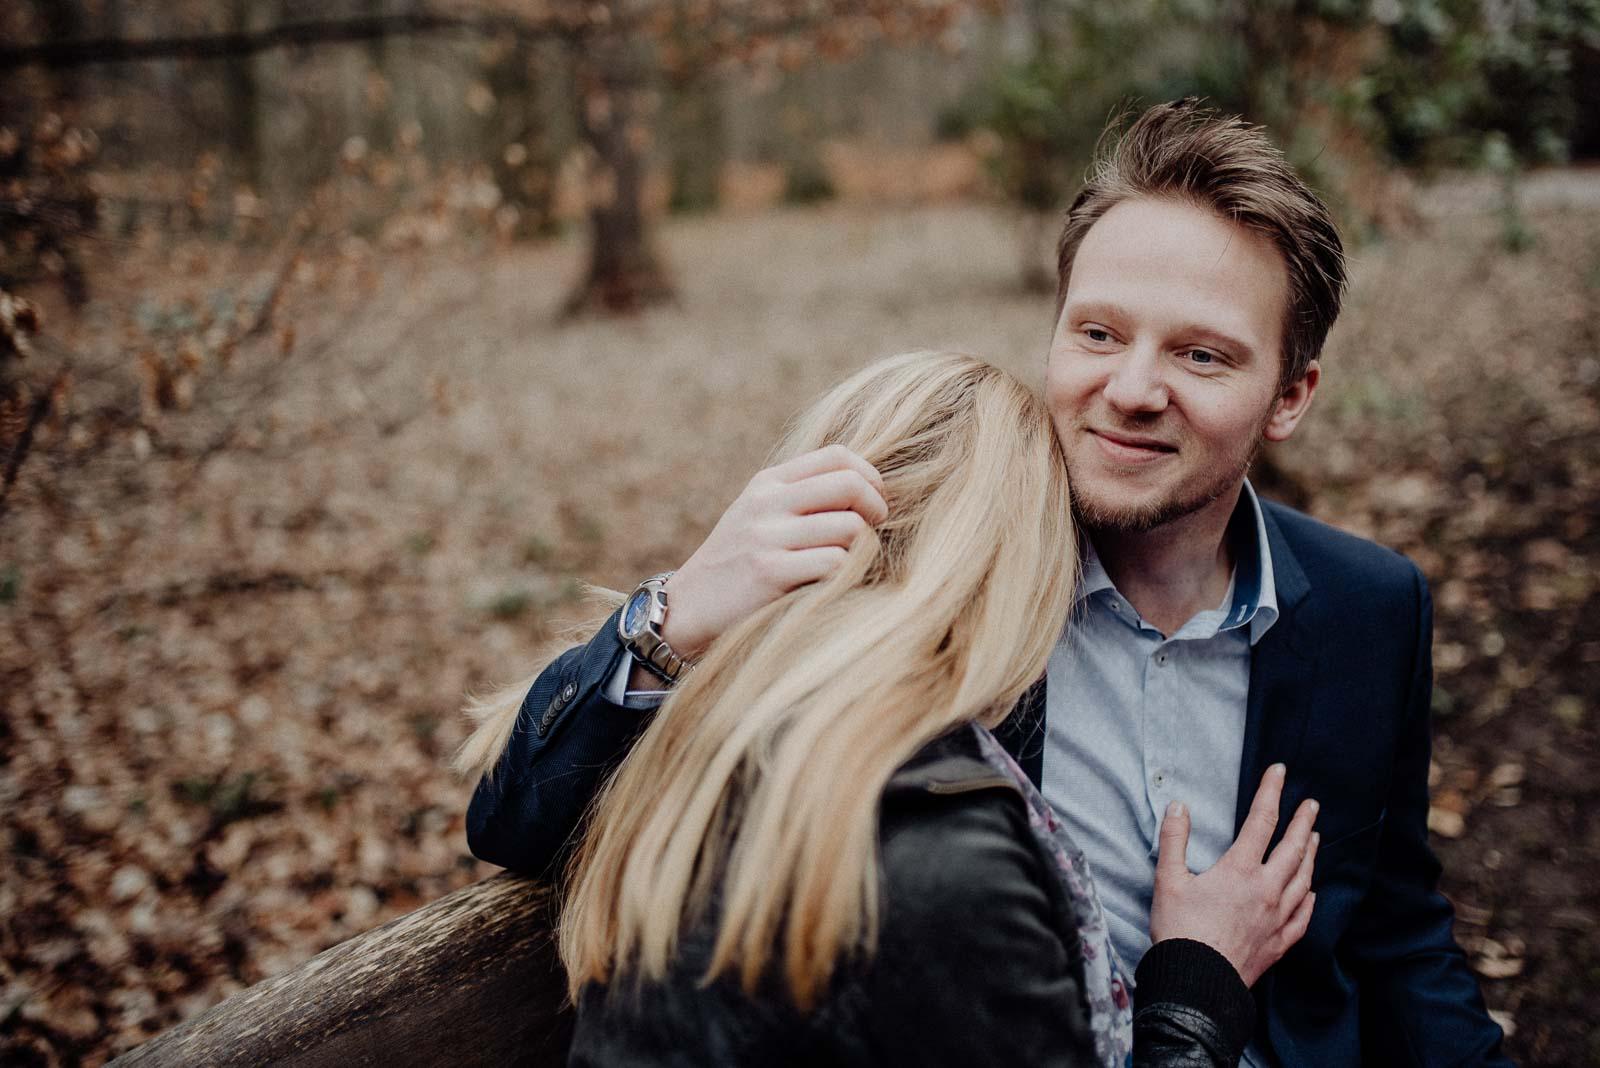 016-verlobungsshooting-engagement-fotograf-witten-rombergpark-dortmund